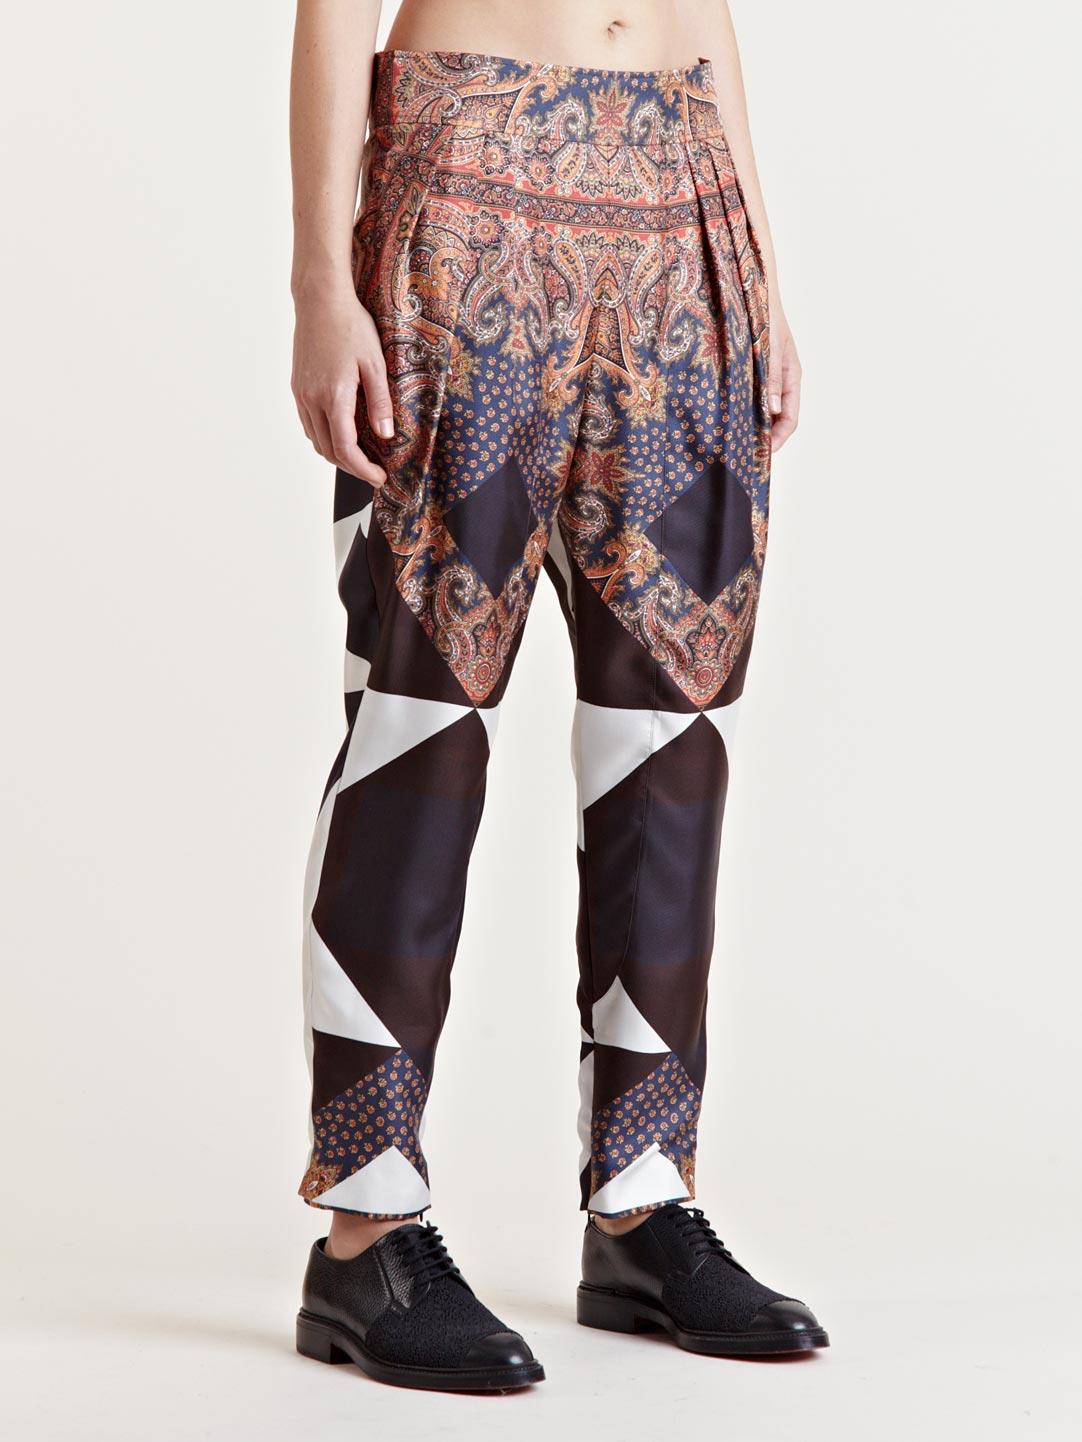 Patterned Pants Womens Custom Design Ideas